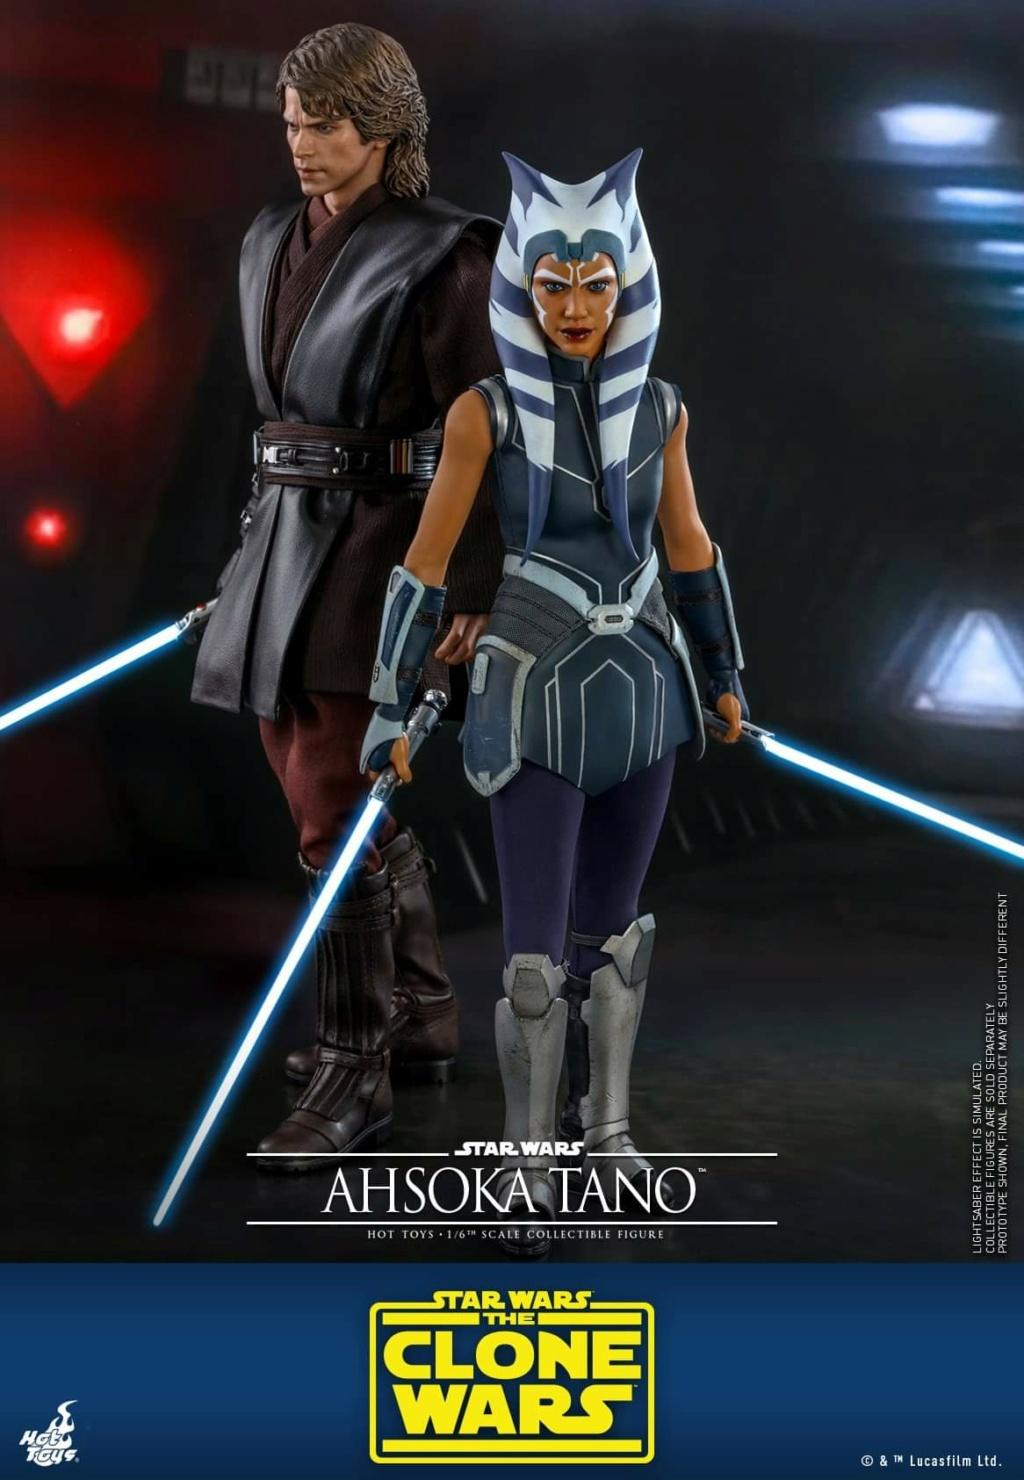 Ahsoka Tano - 1/6th scale - The Clone Wars - Hot Toys Fb_im130